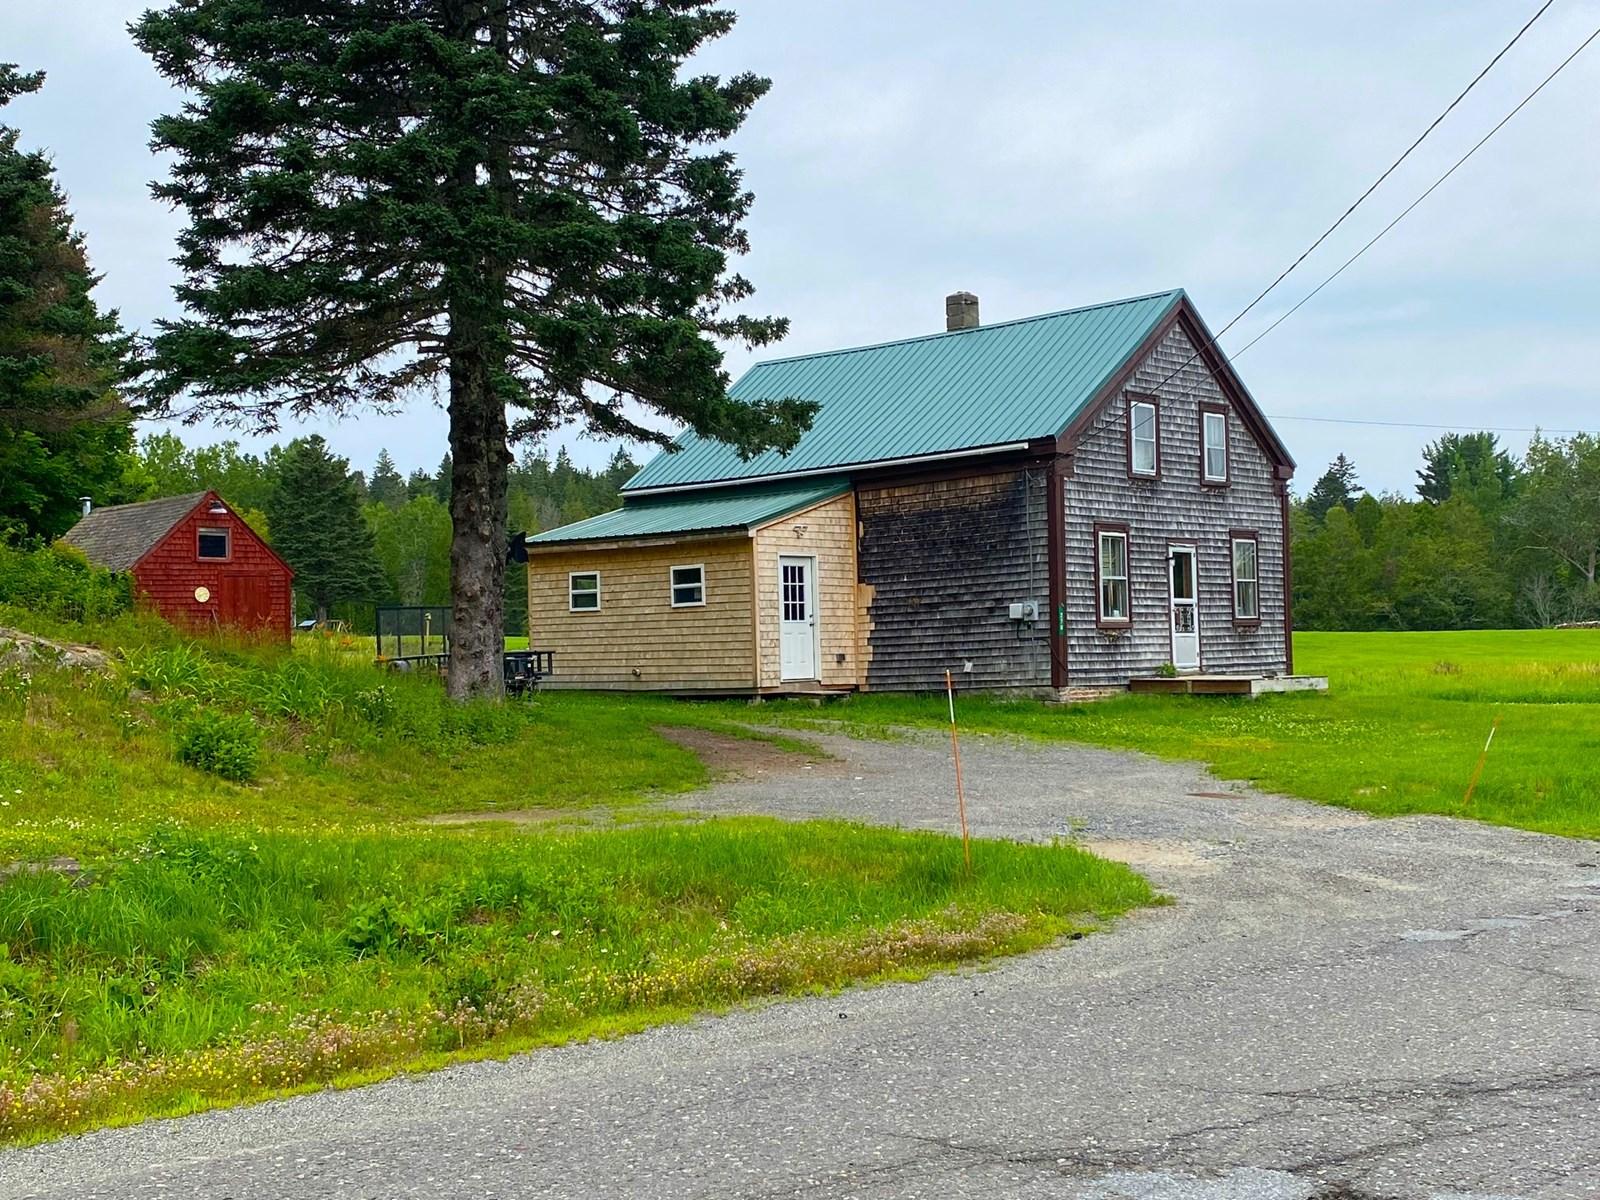 1800's Farmhouse in Lubec, Maine